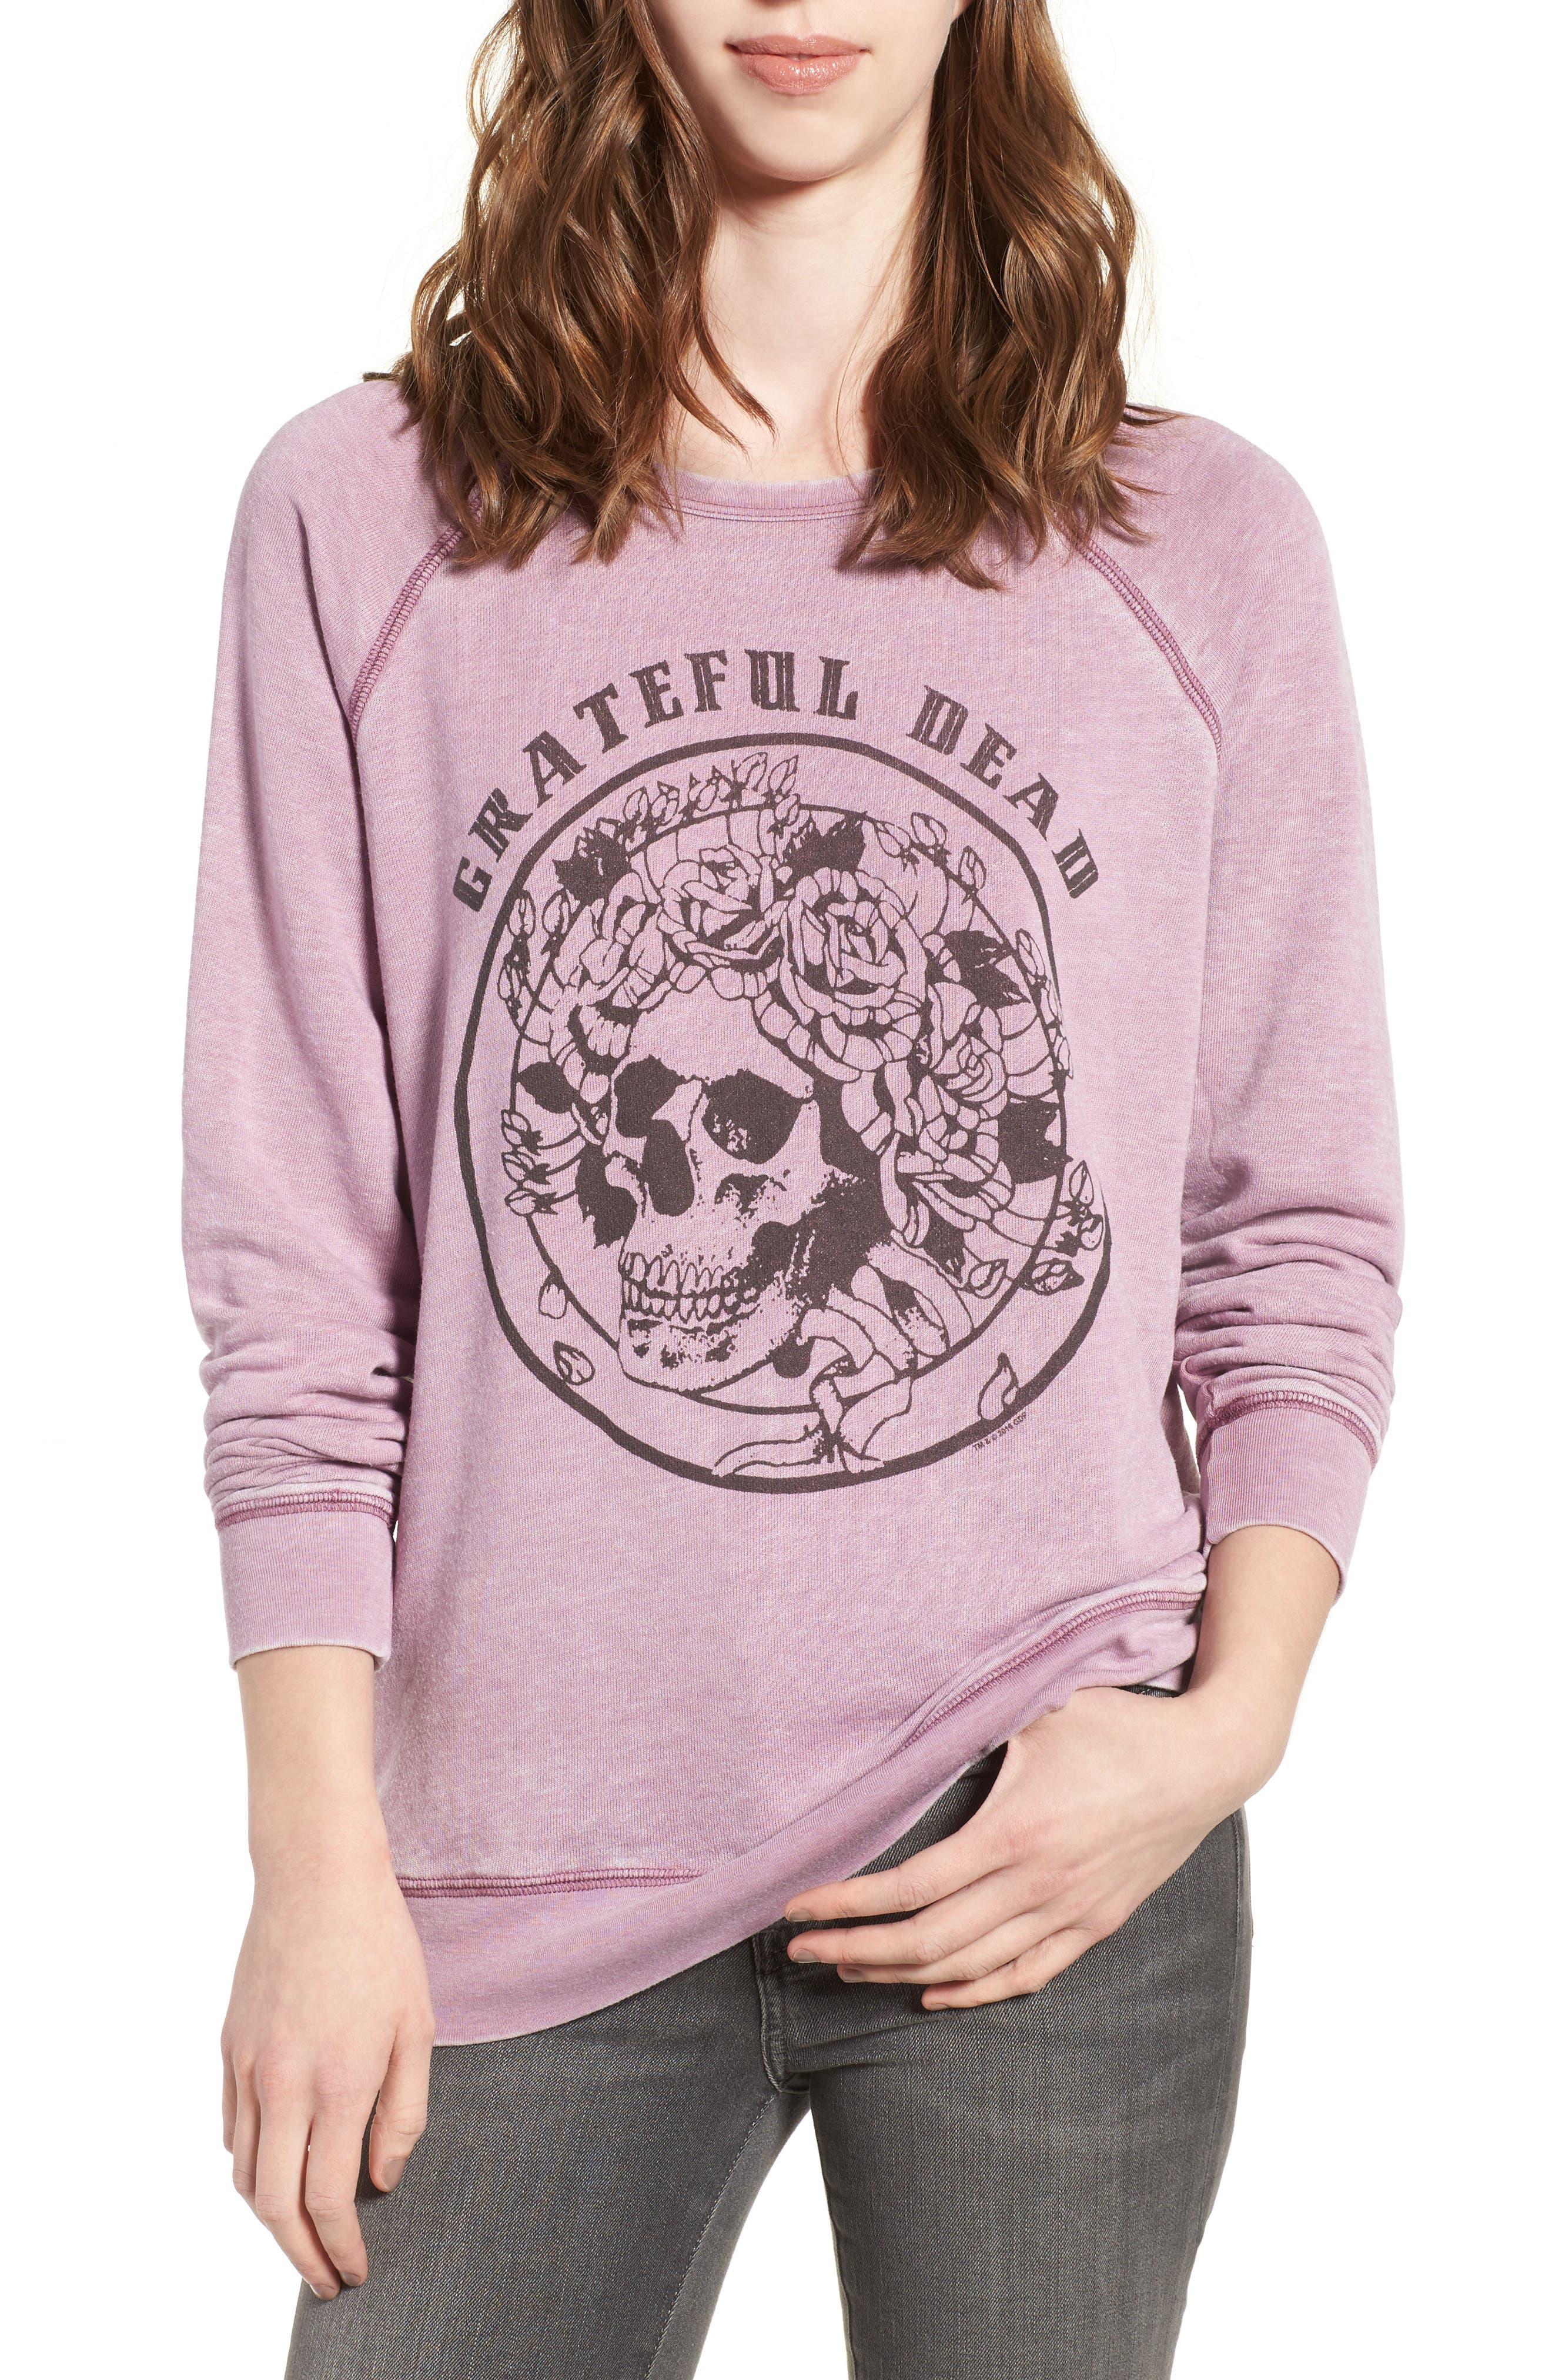 Junk Food Grateful Dead Burnout Sweatshirt